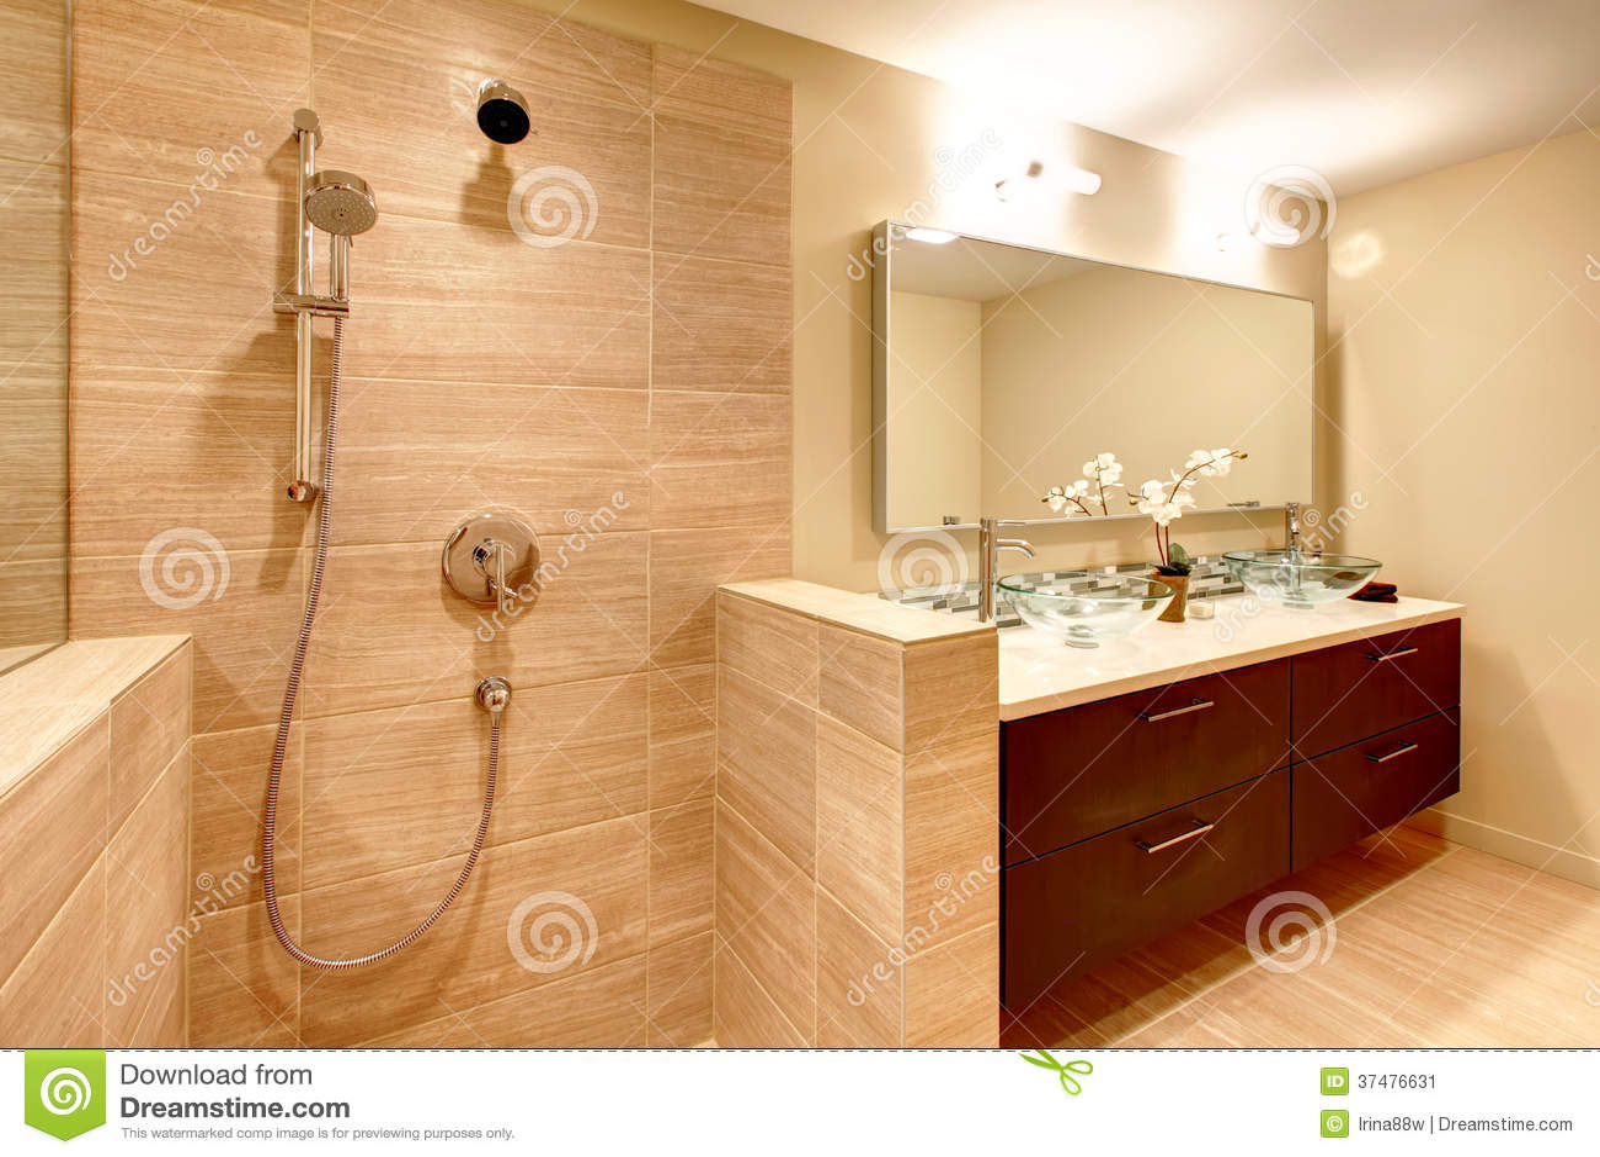 Elegant Warm Tones Bathroom Stock Image Image 37476631